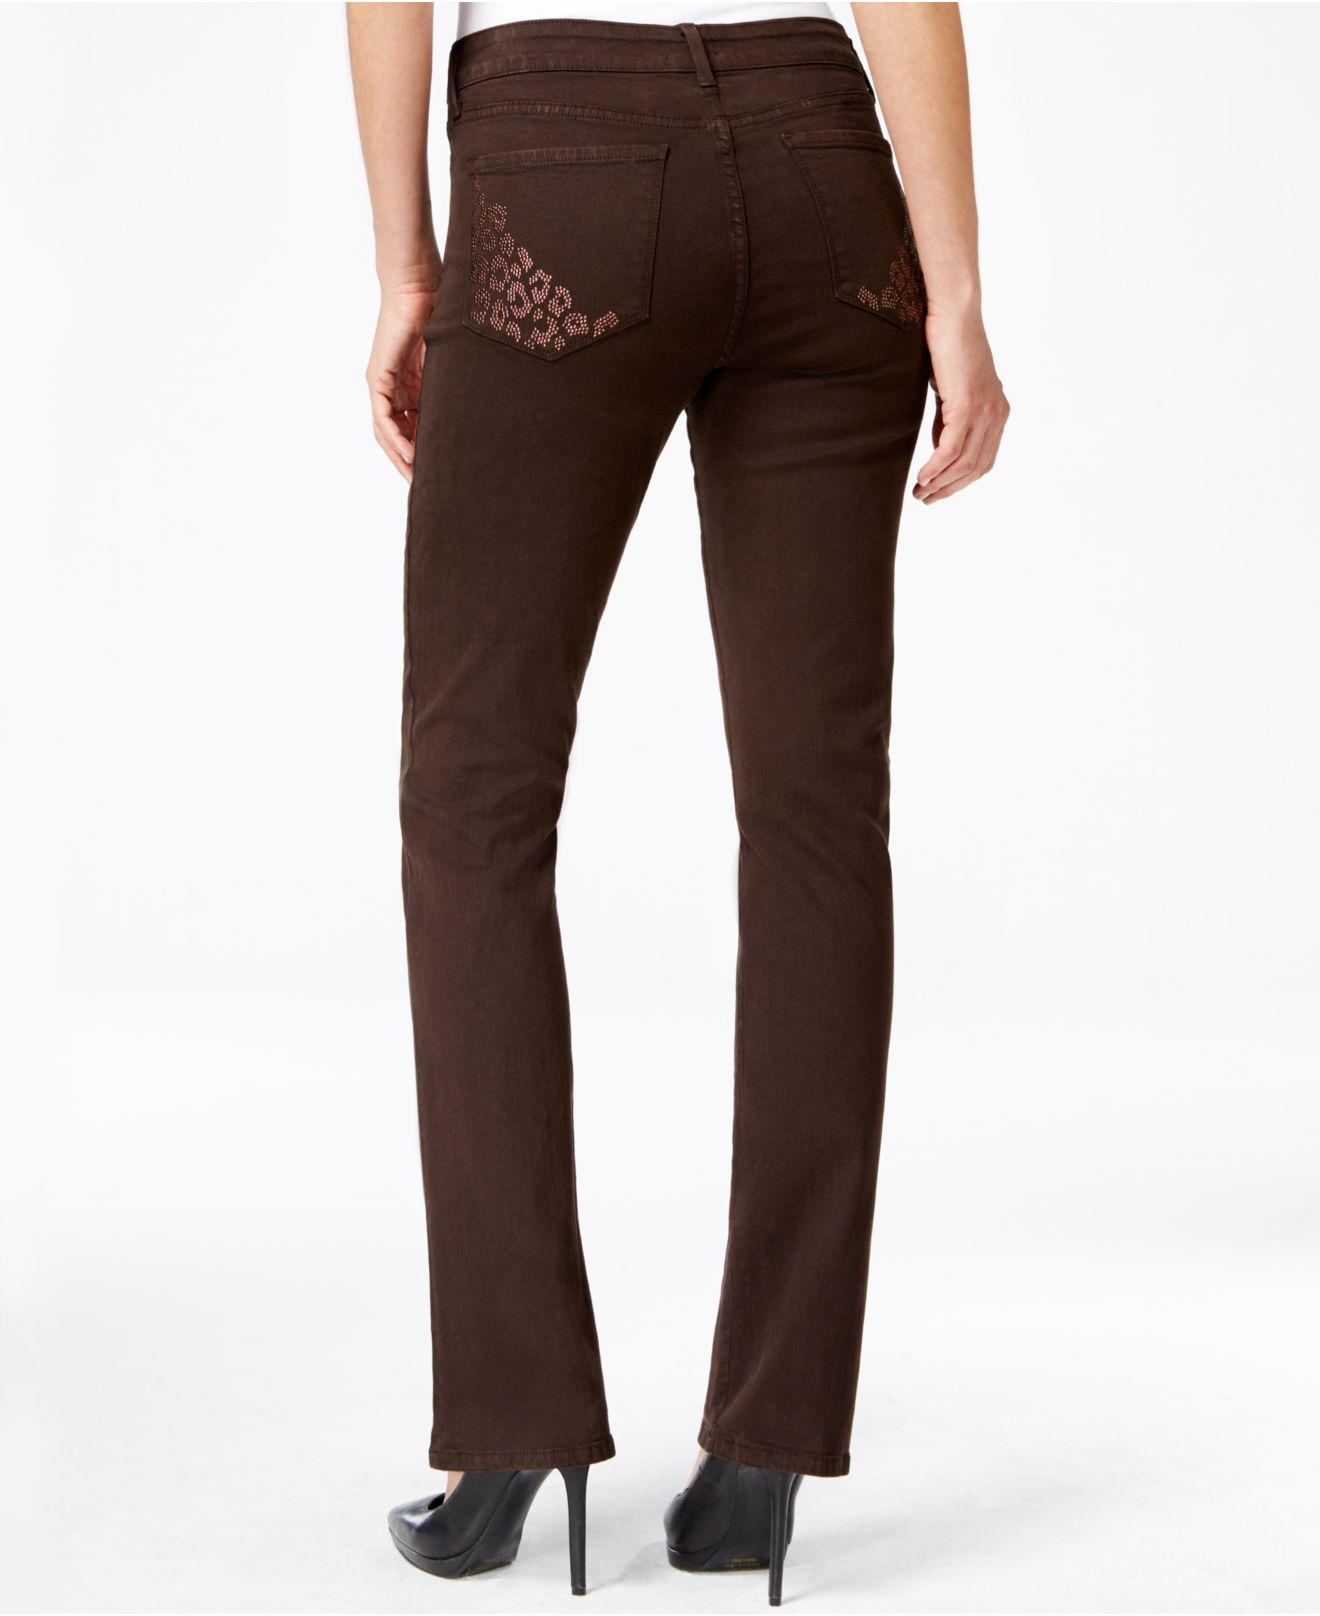 Nydj Petite Embellished-pocket Bootcut Jeans in Brown | Lyst